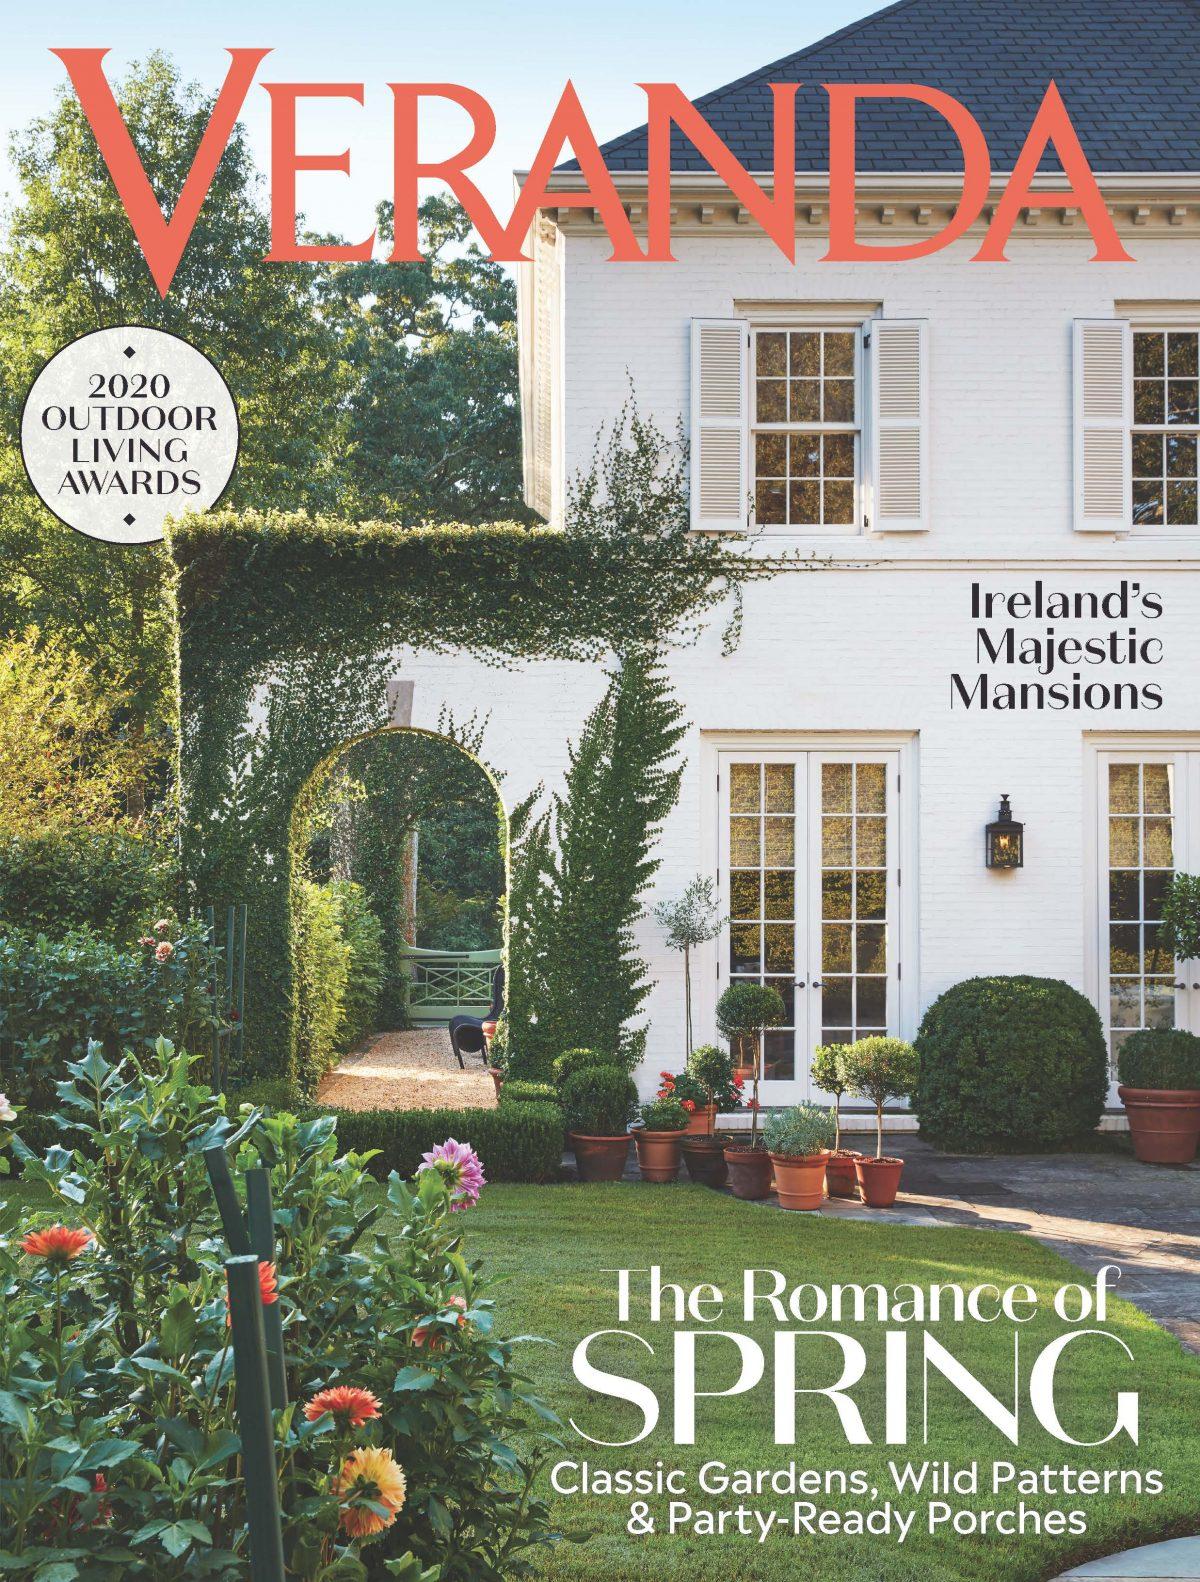 Veranda Features Hollander Design Garden